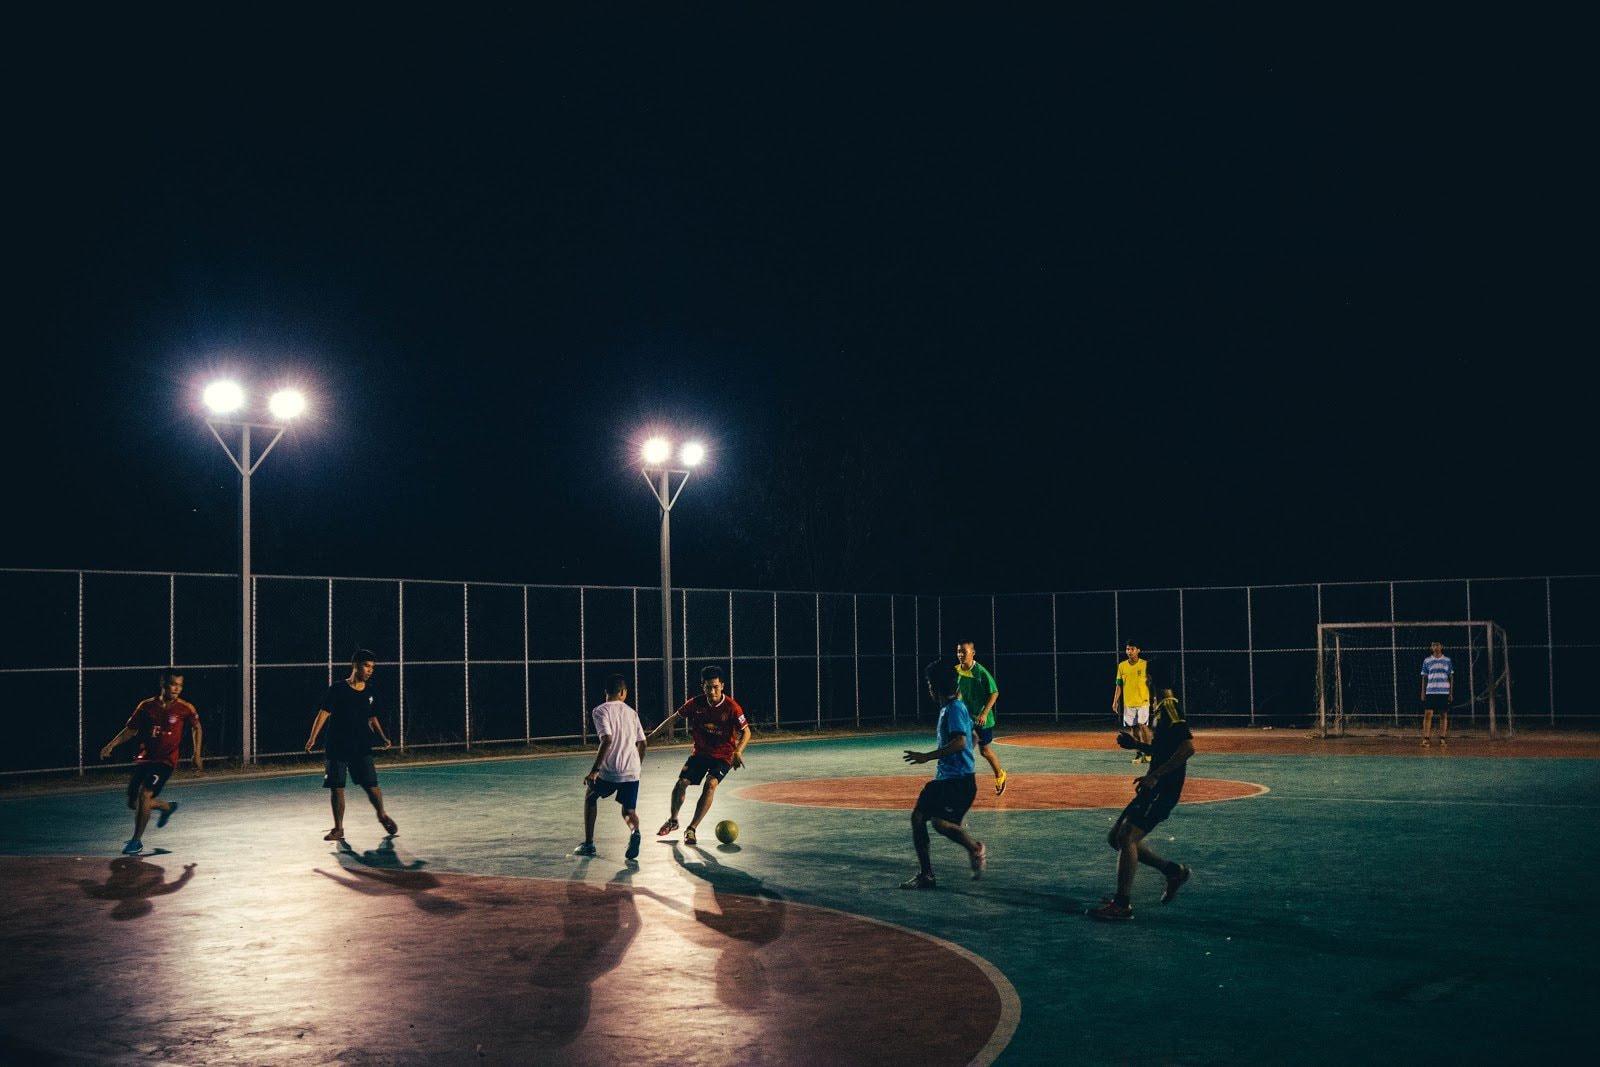 sports-photography-igor-ovsyannyko